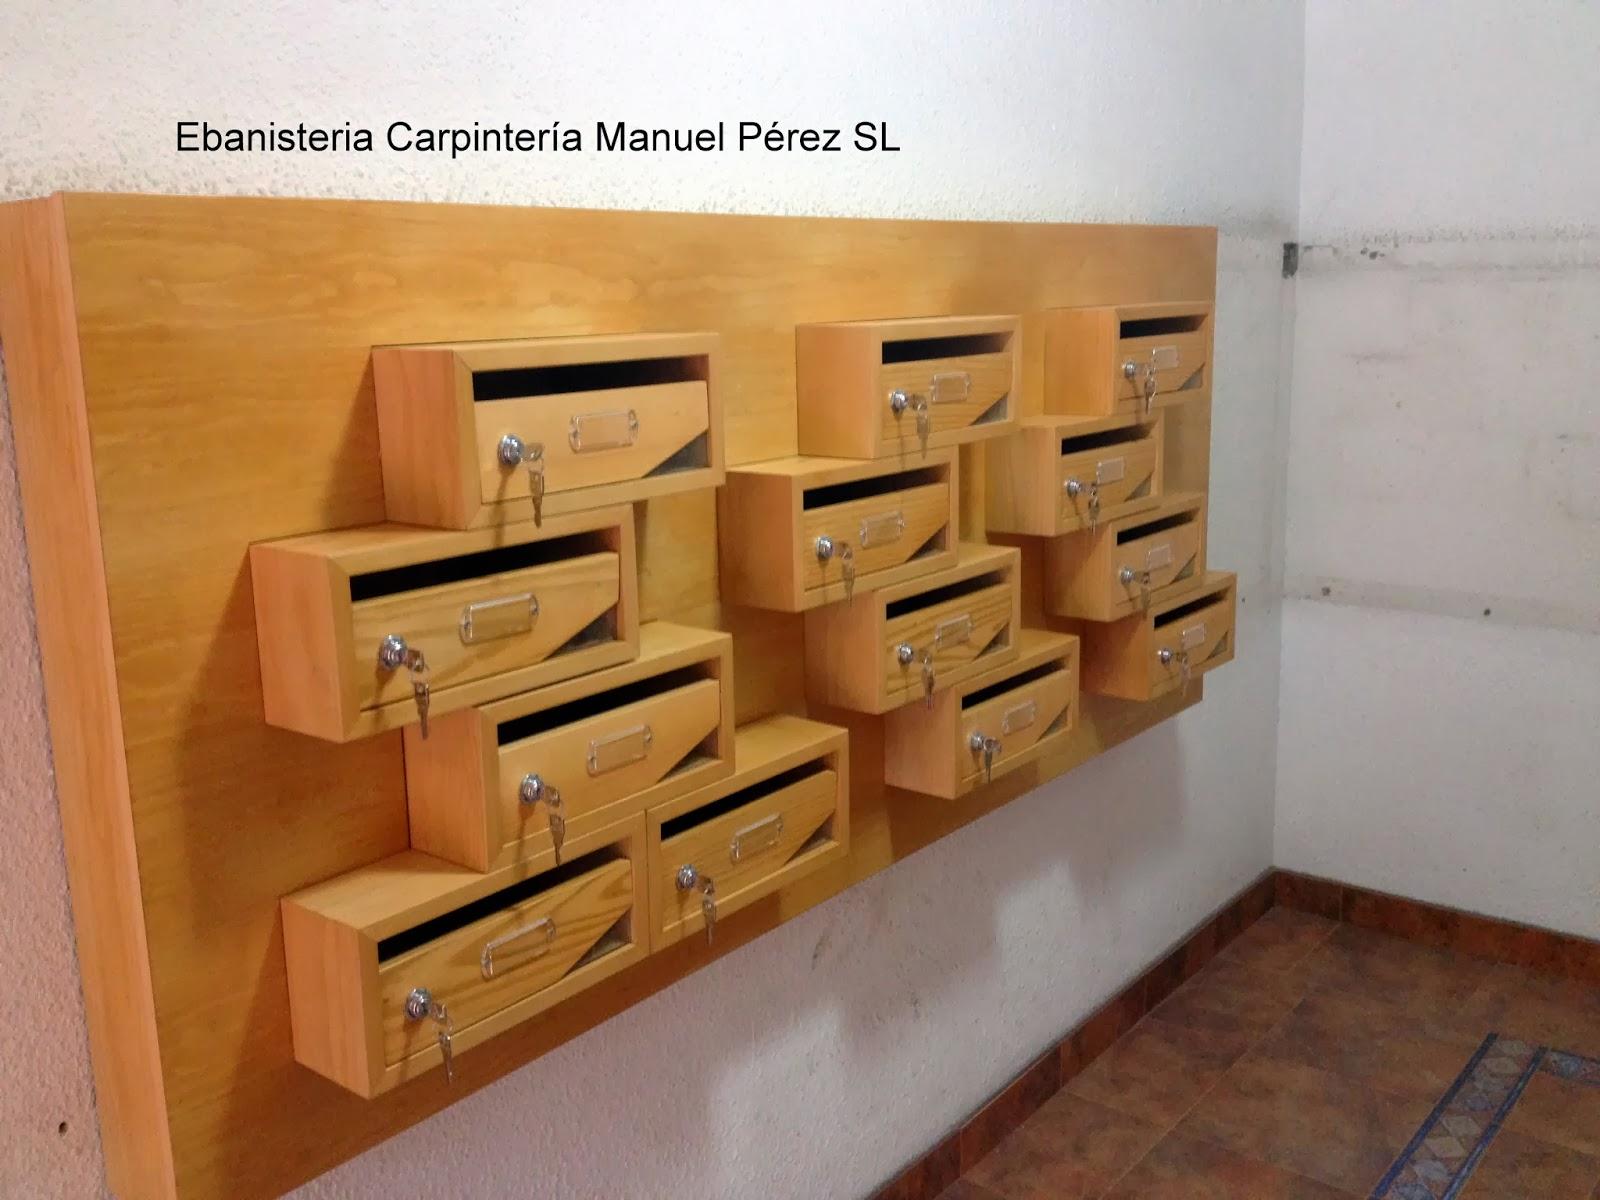 Ebanisteria carpinteria manuel perez zaragoza buzones for Buzones para comunidades